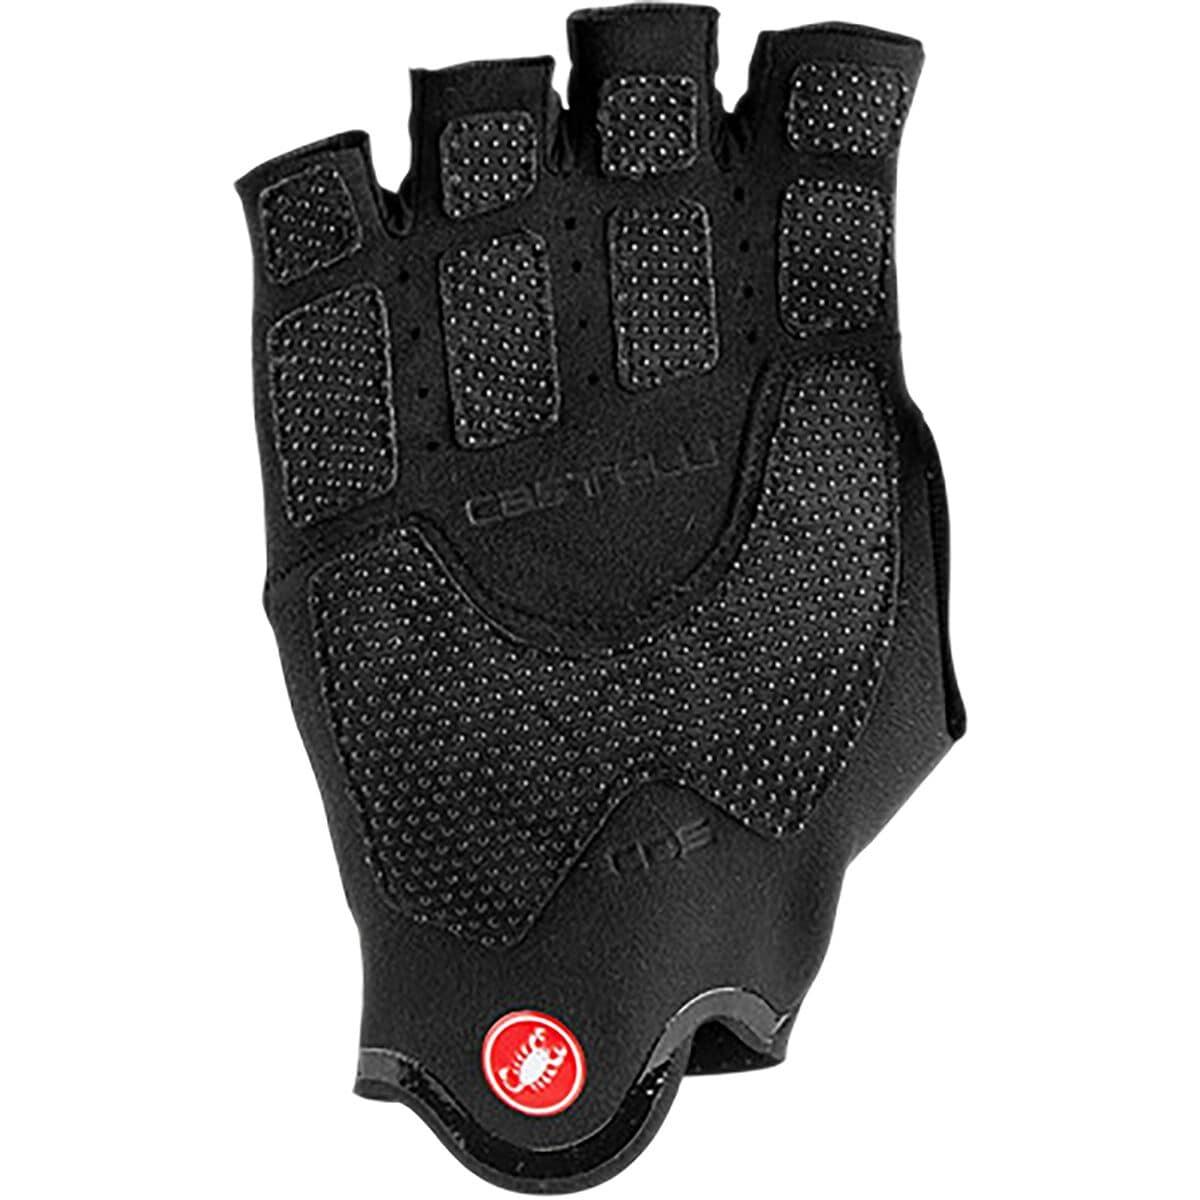 Castelli-Cabrio-Glove-Men-039-s miniature 4